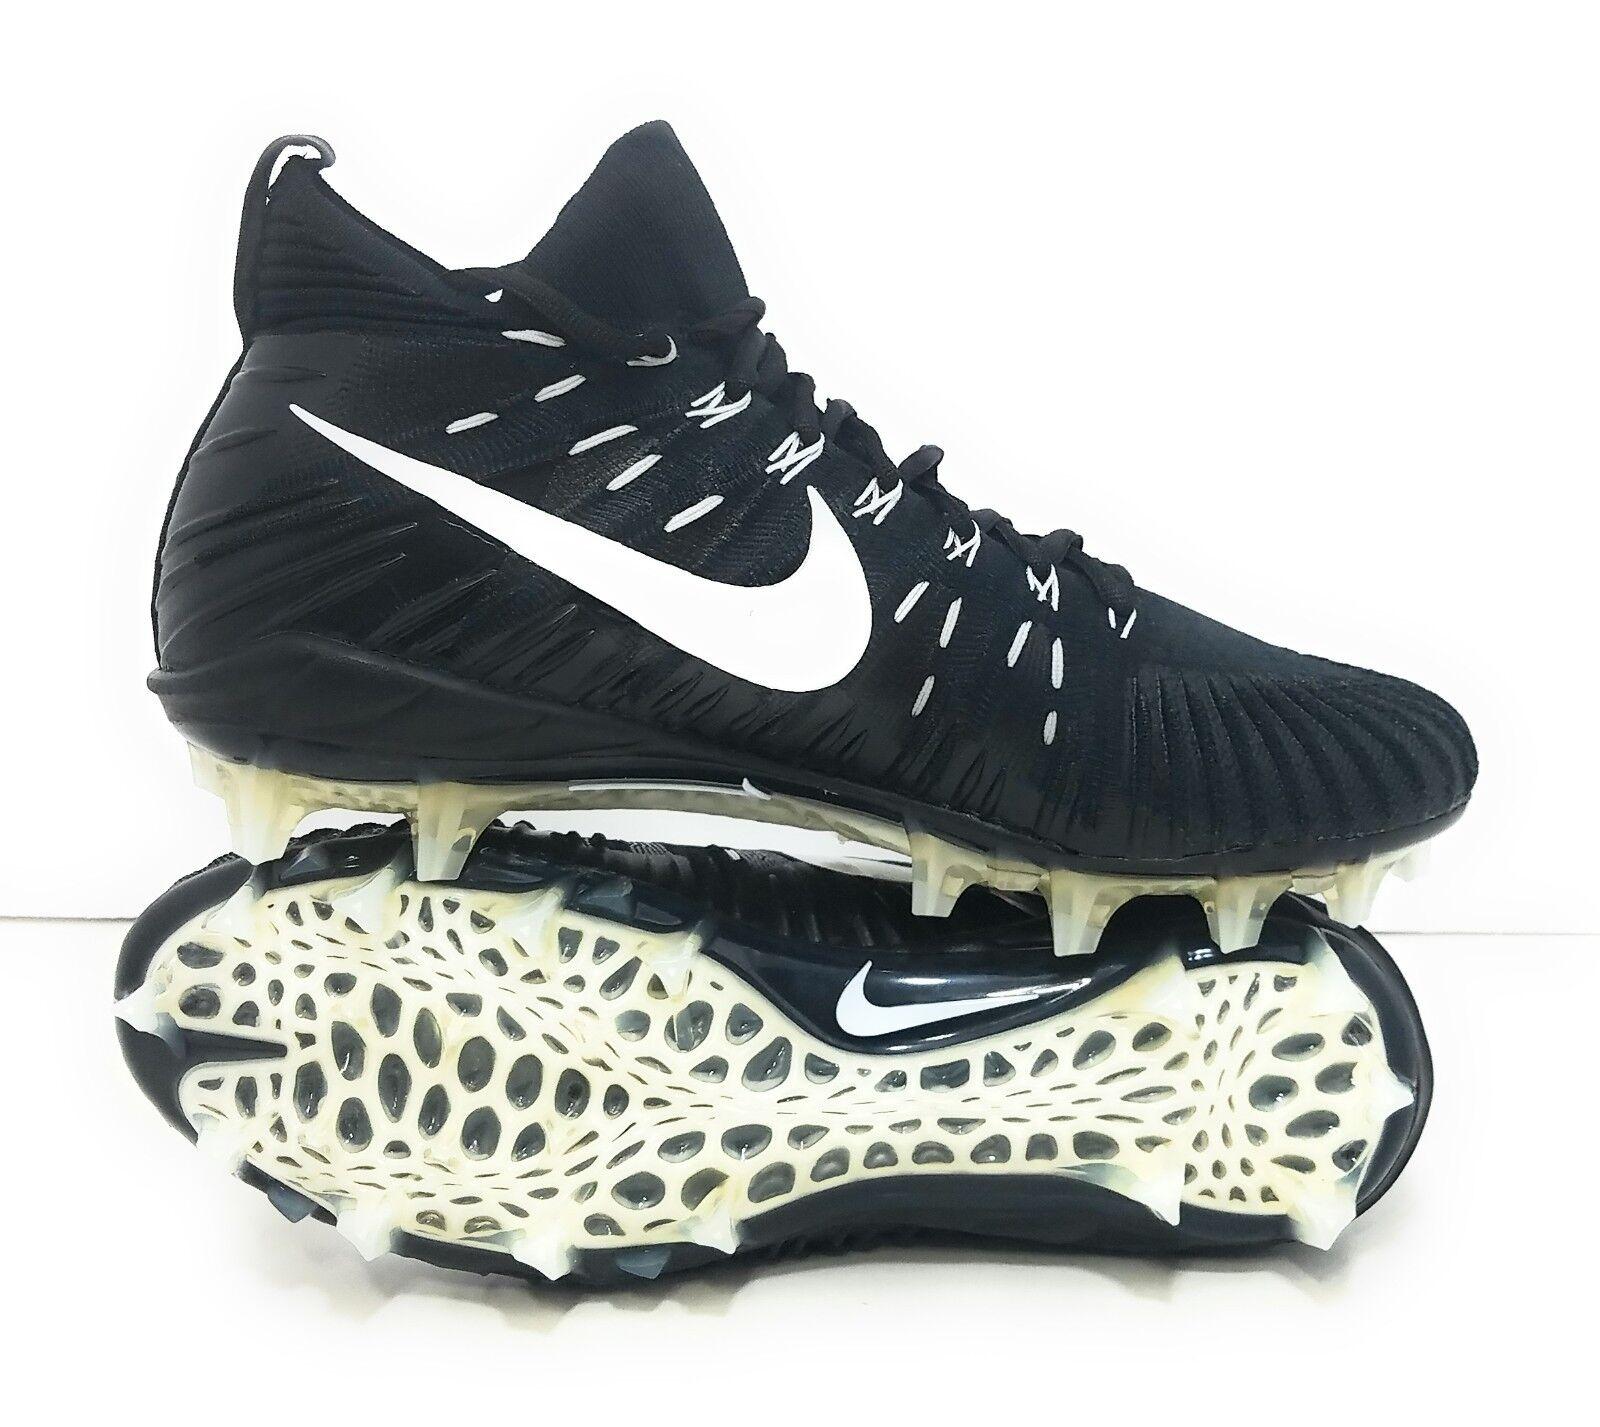 Nike Alpha Menace Elite Football Cleats 871519-010 Black White Mens SZ 13 NEW